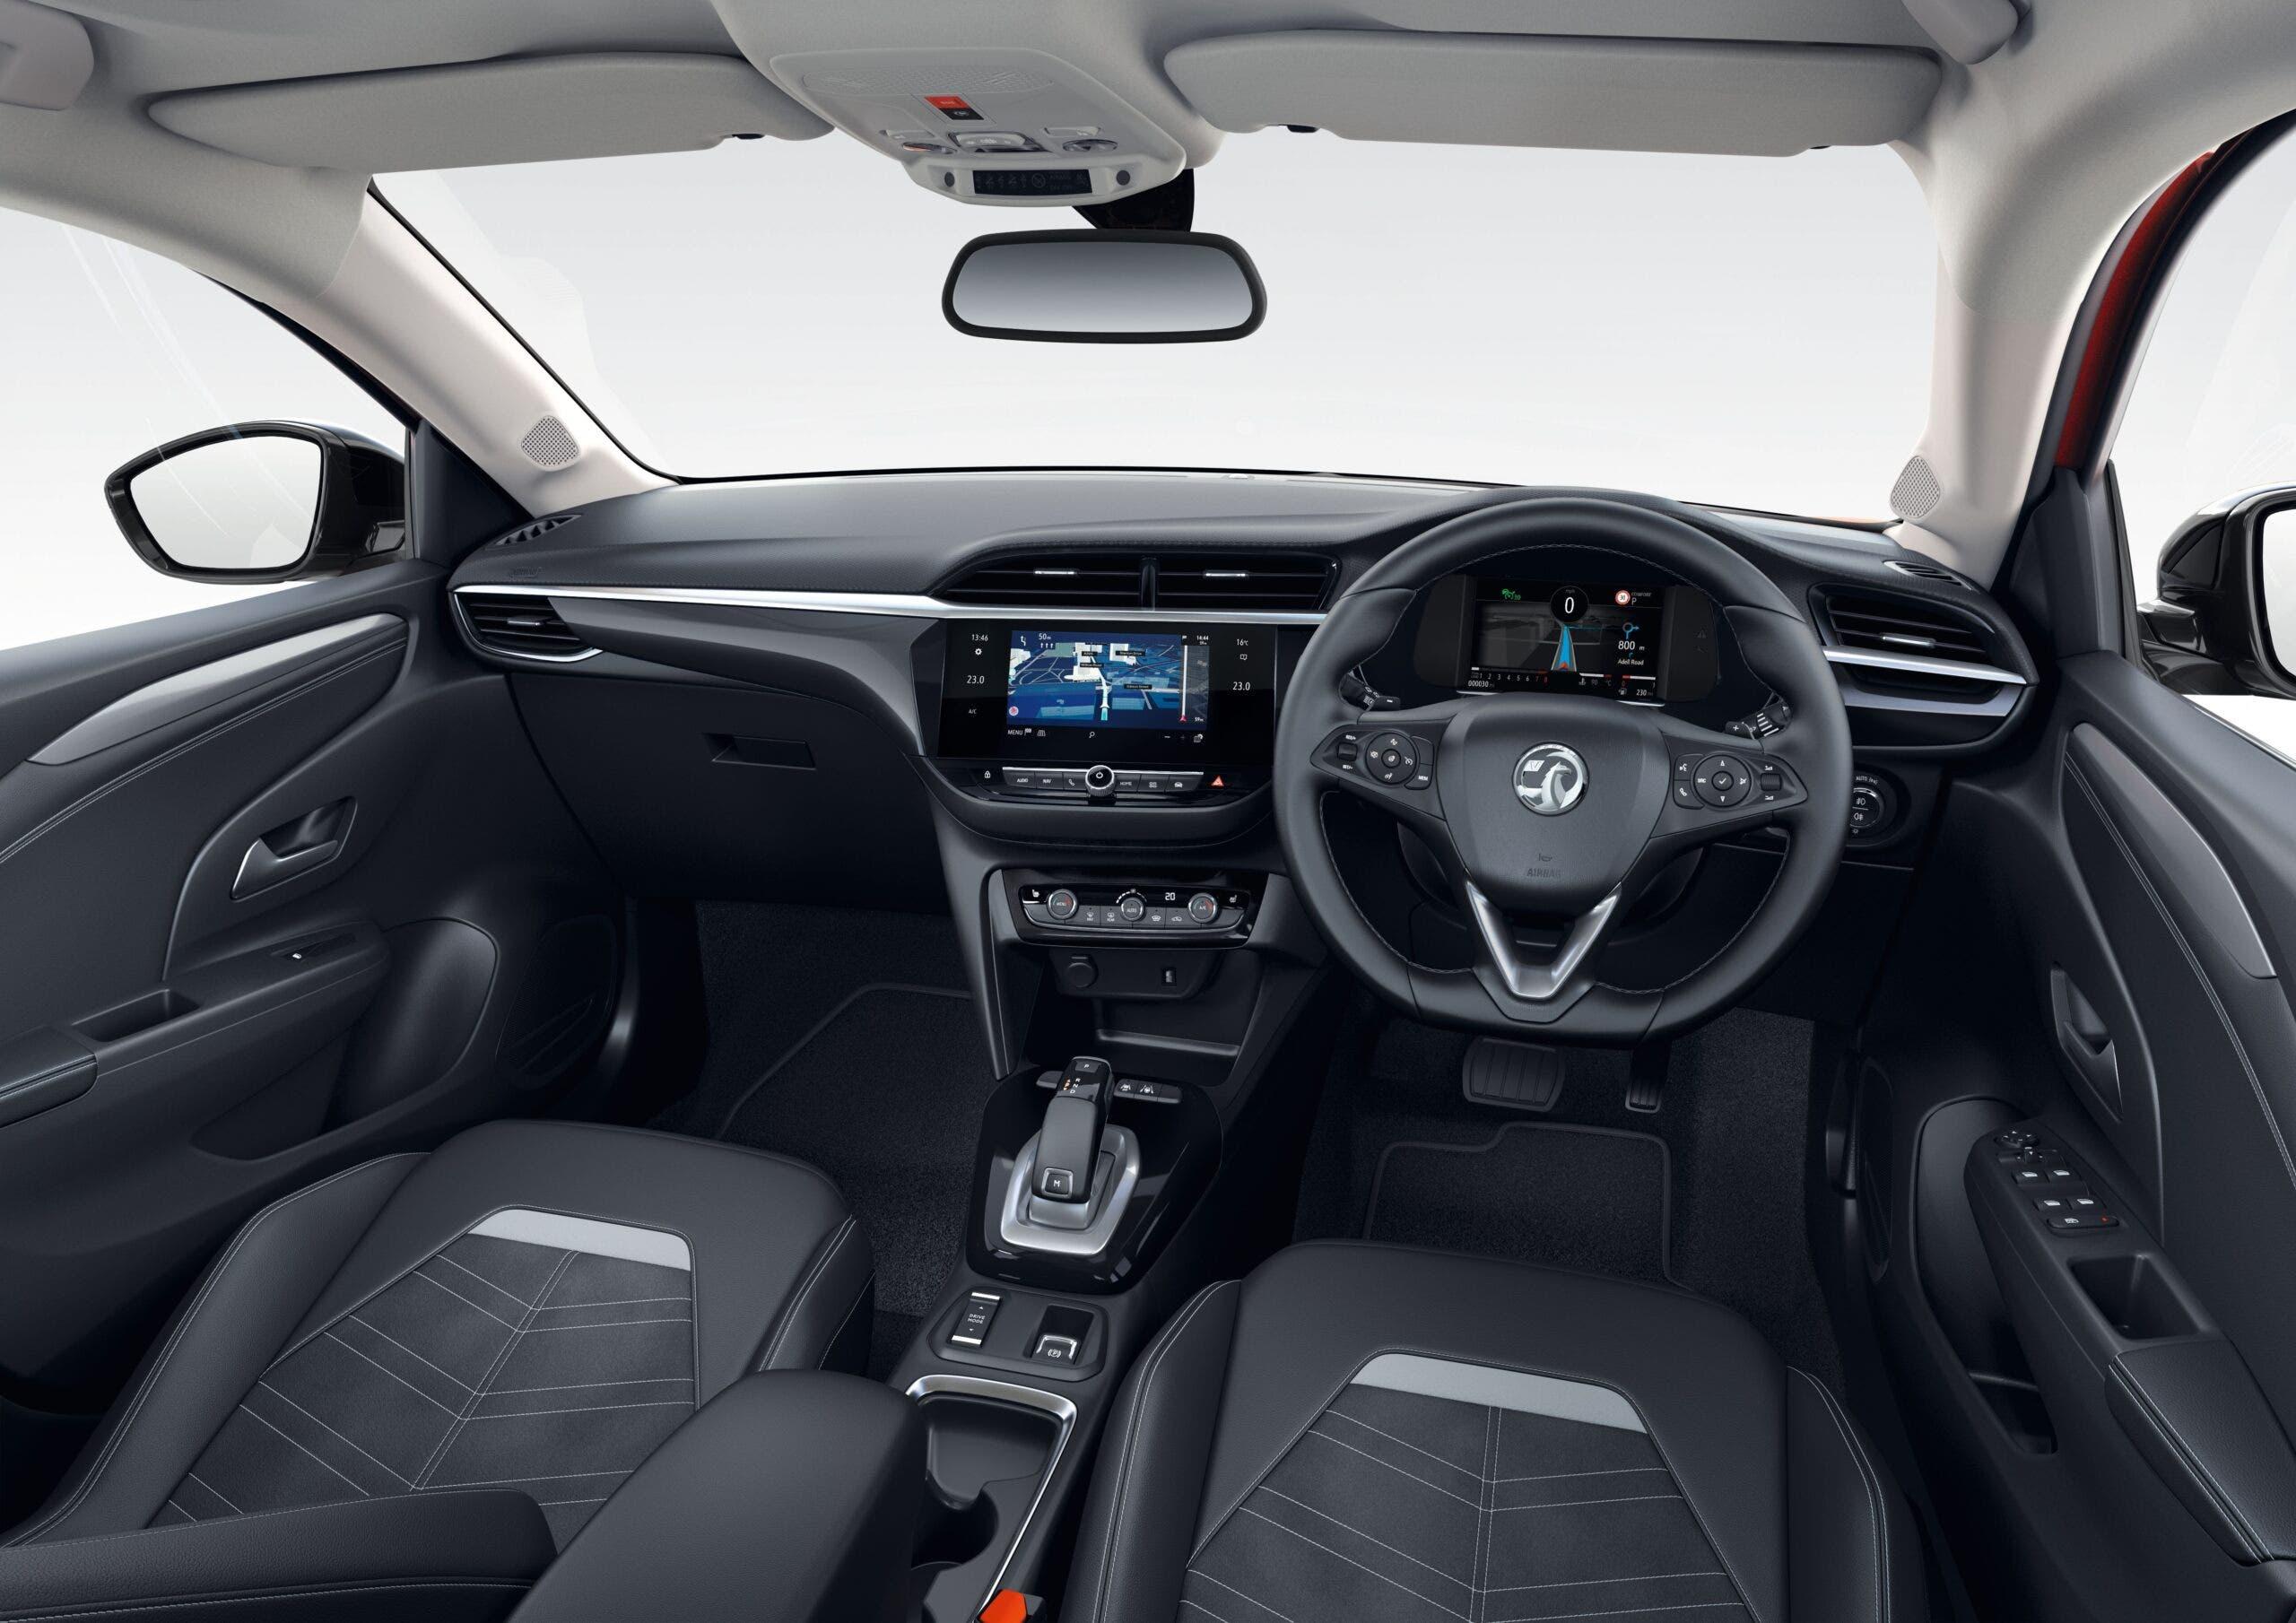 Vauxhall Corsa e Corsa-e 2021